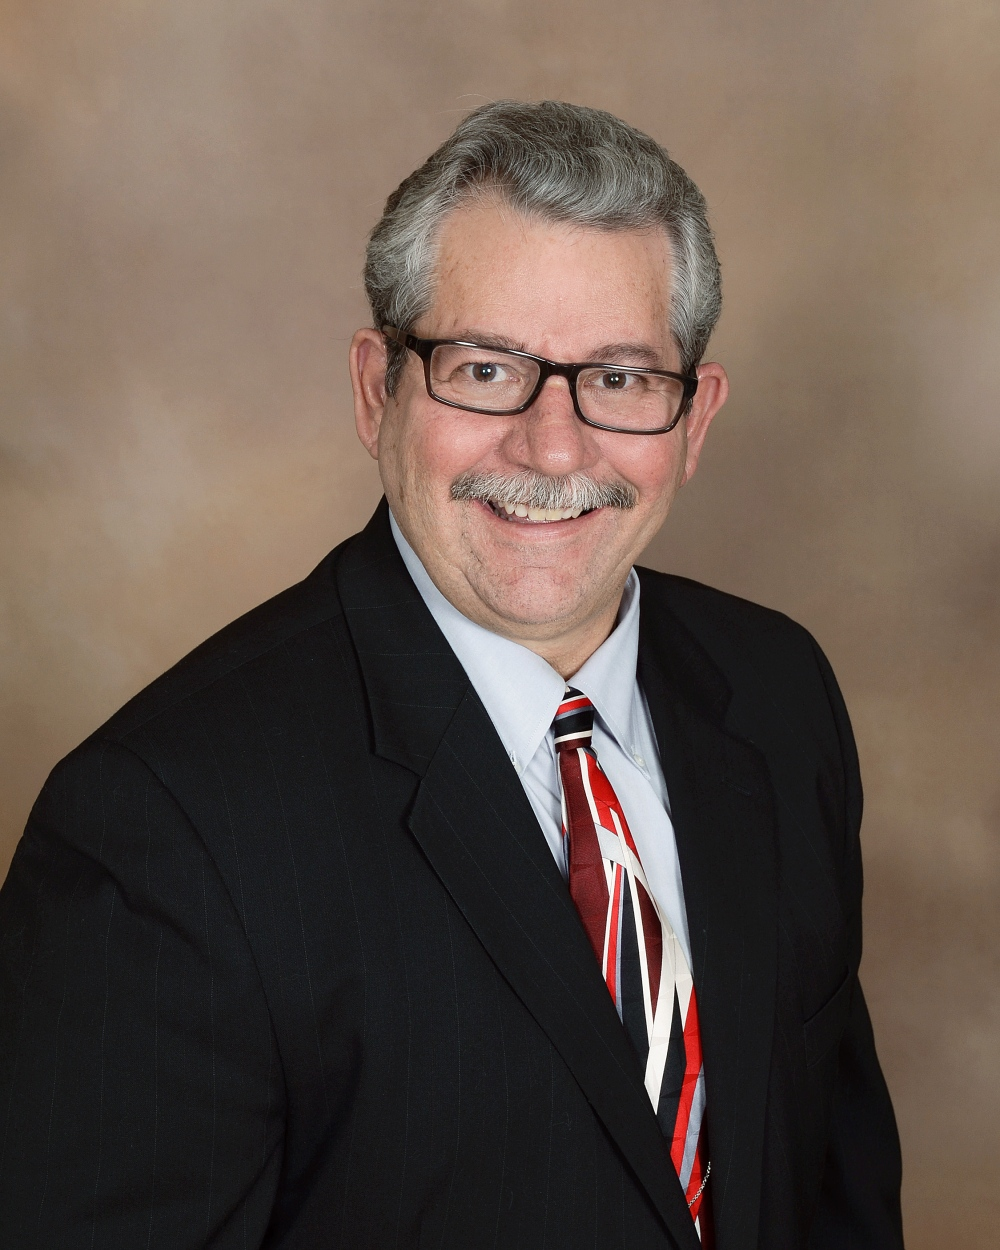 Pastor Chuck Rager